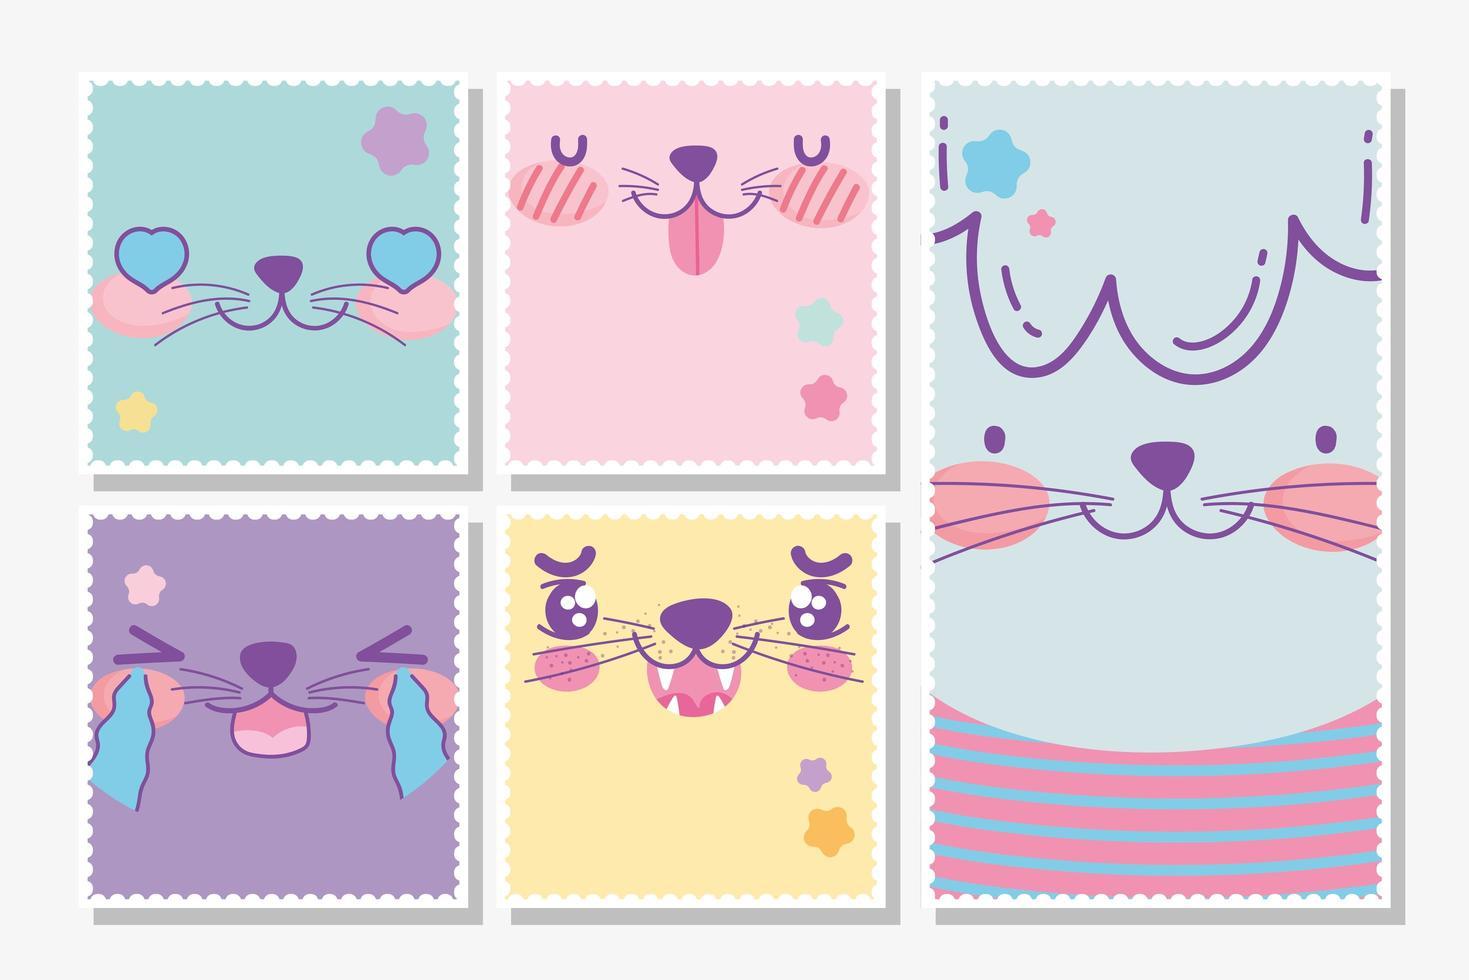 paquete de cartas de caras de animales lindos kawaii vector